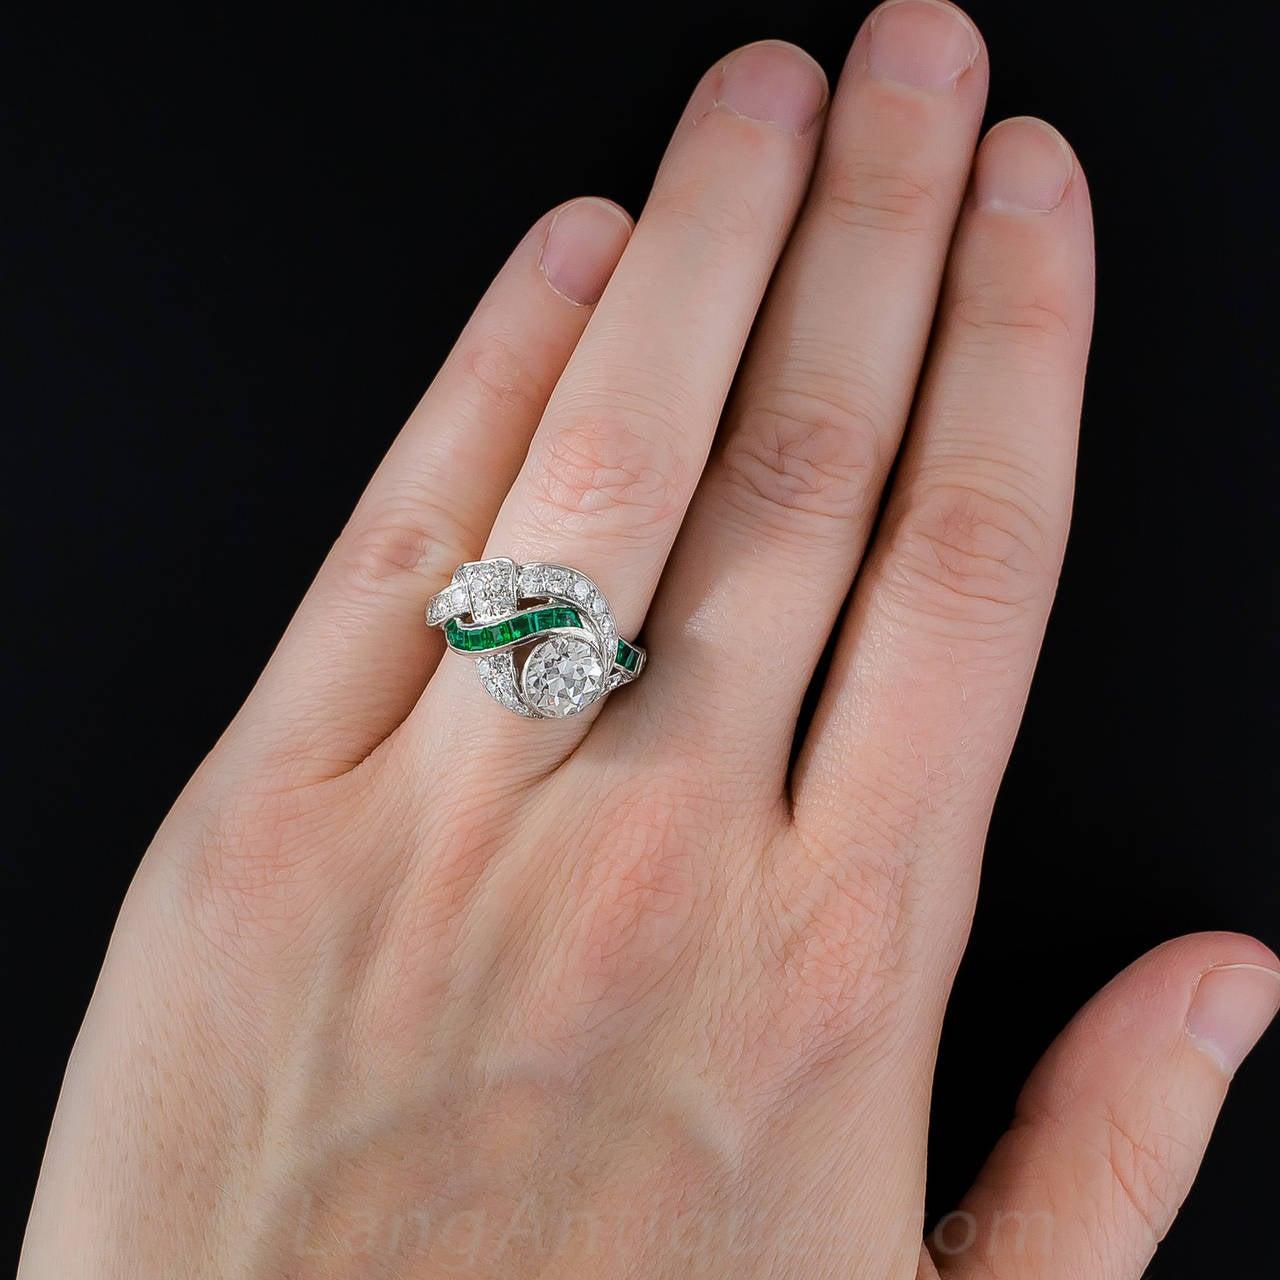 Art Deco 1.97 Carat Center Diamond and Emerald Ring 7